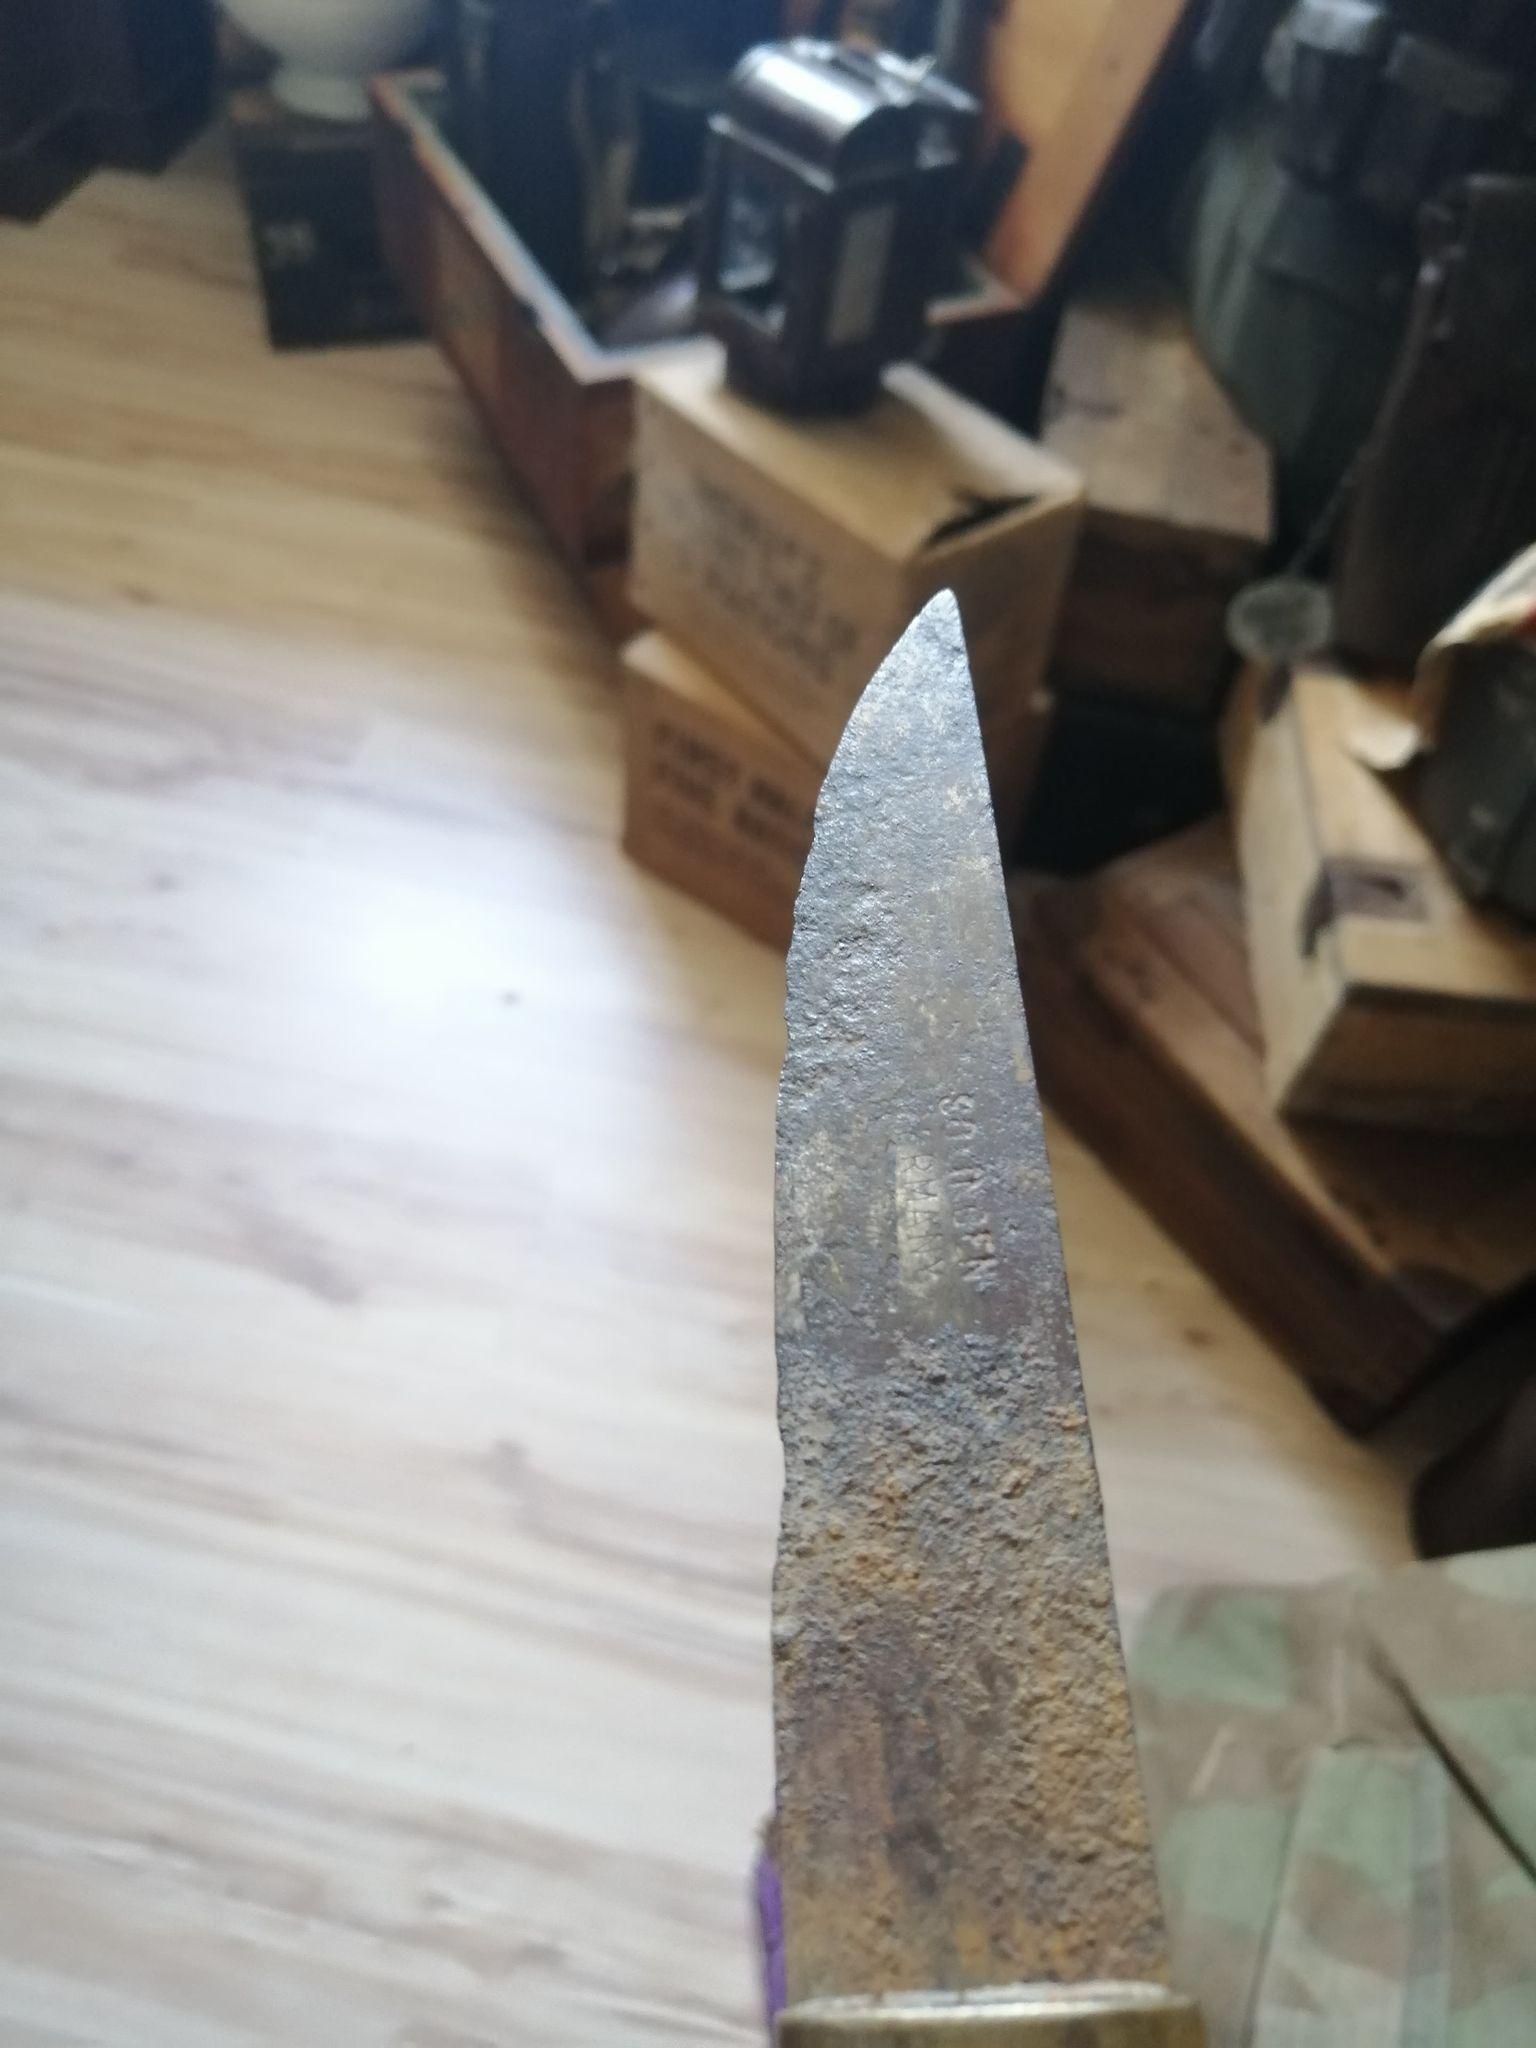 couteau a cran ancien marquage solingen germany 18366710